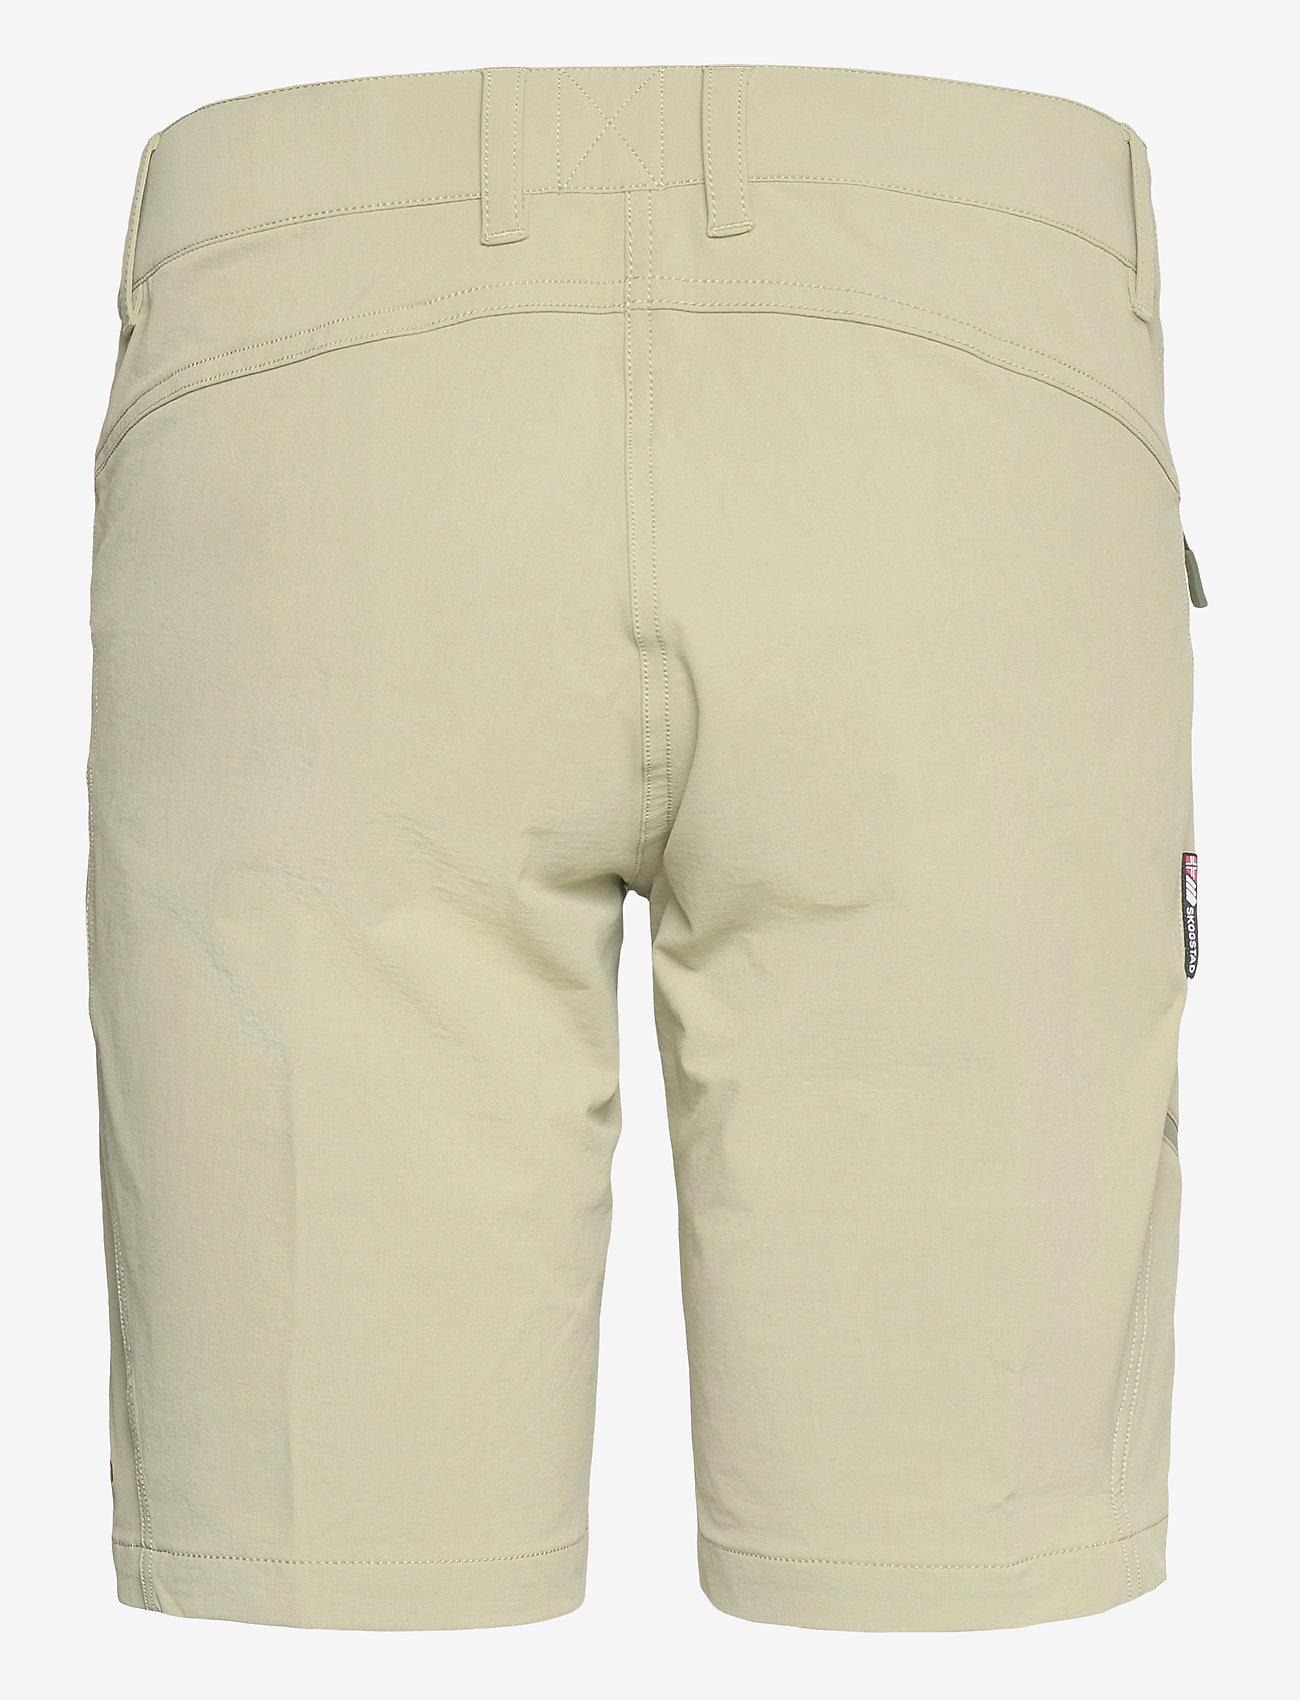 Skogstad - Veotinden   Shorts - short de randonnée - tea - 1